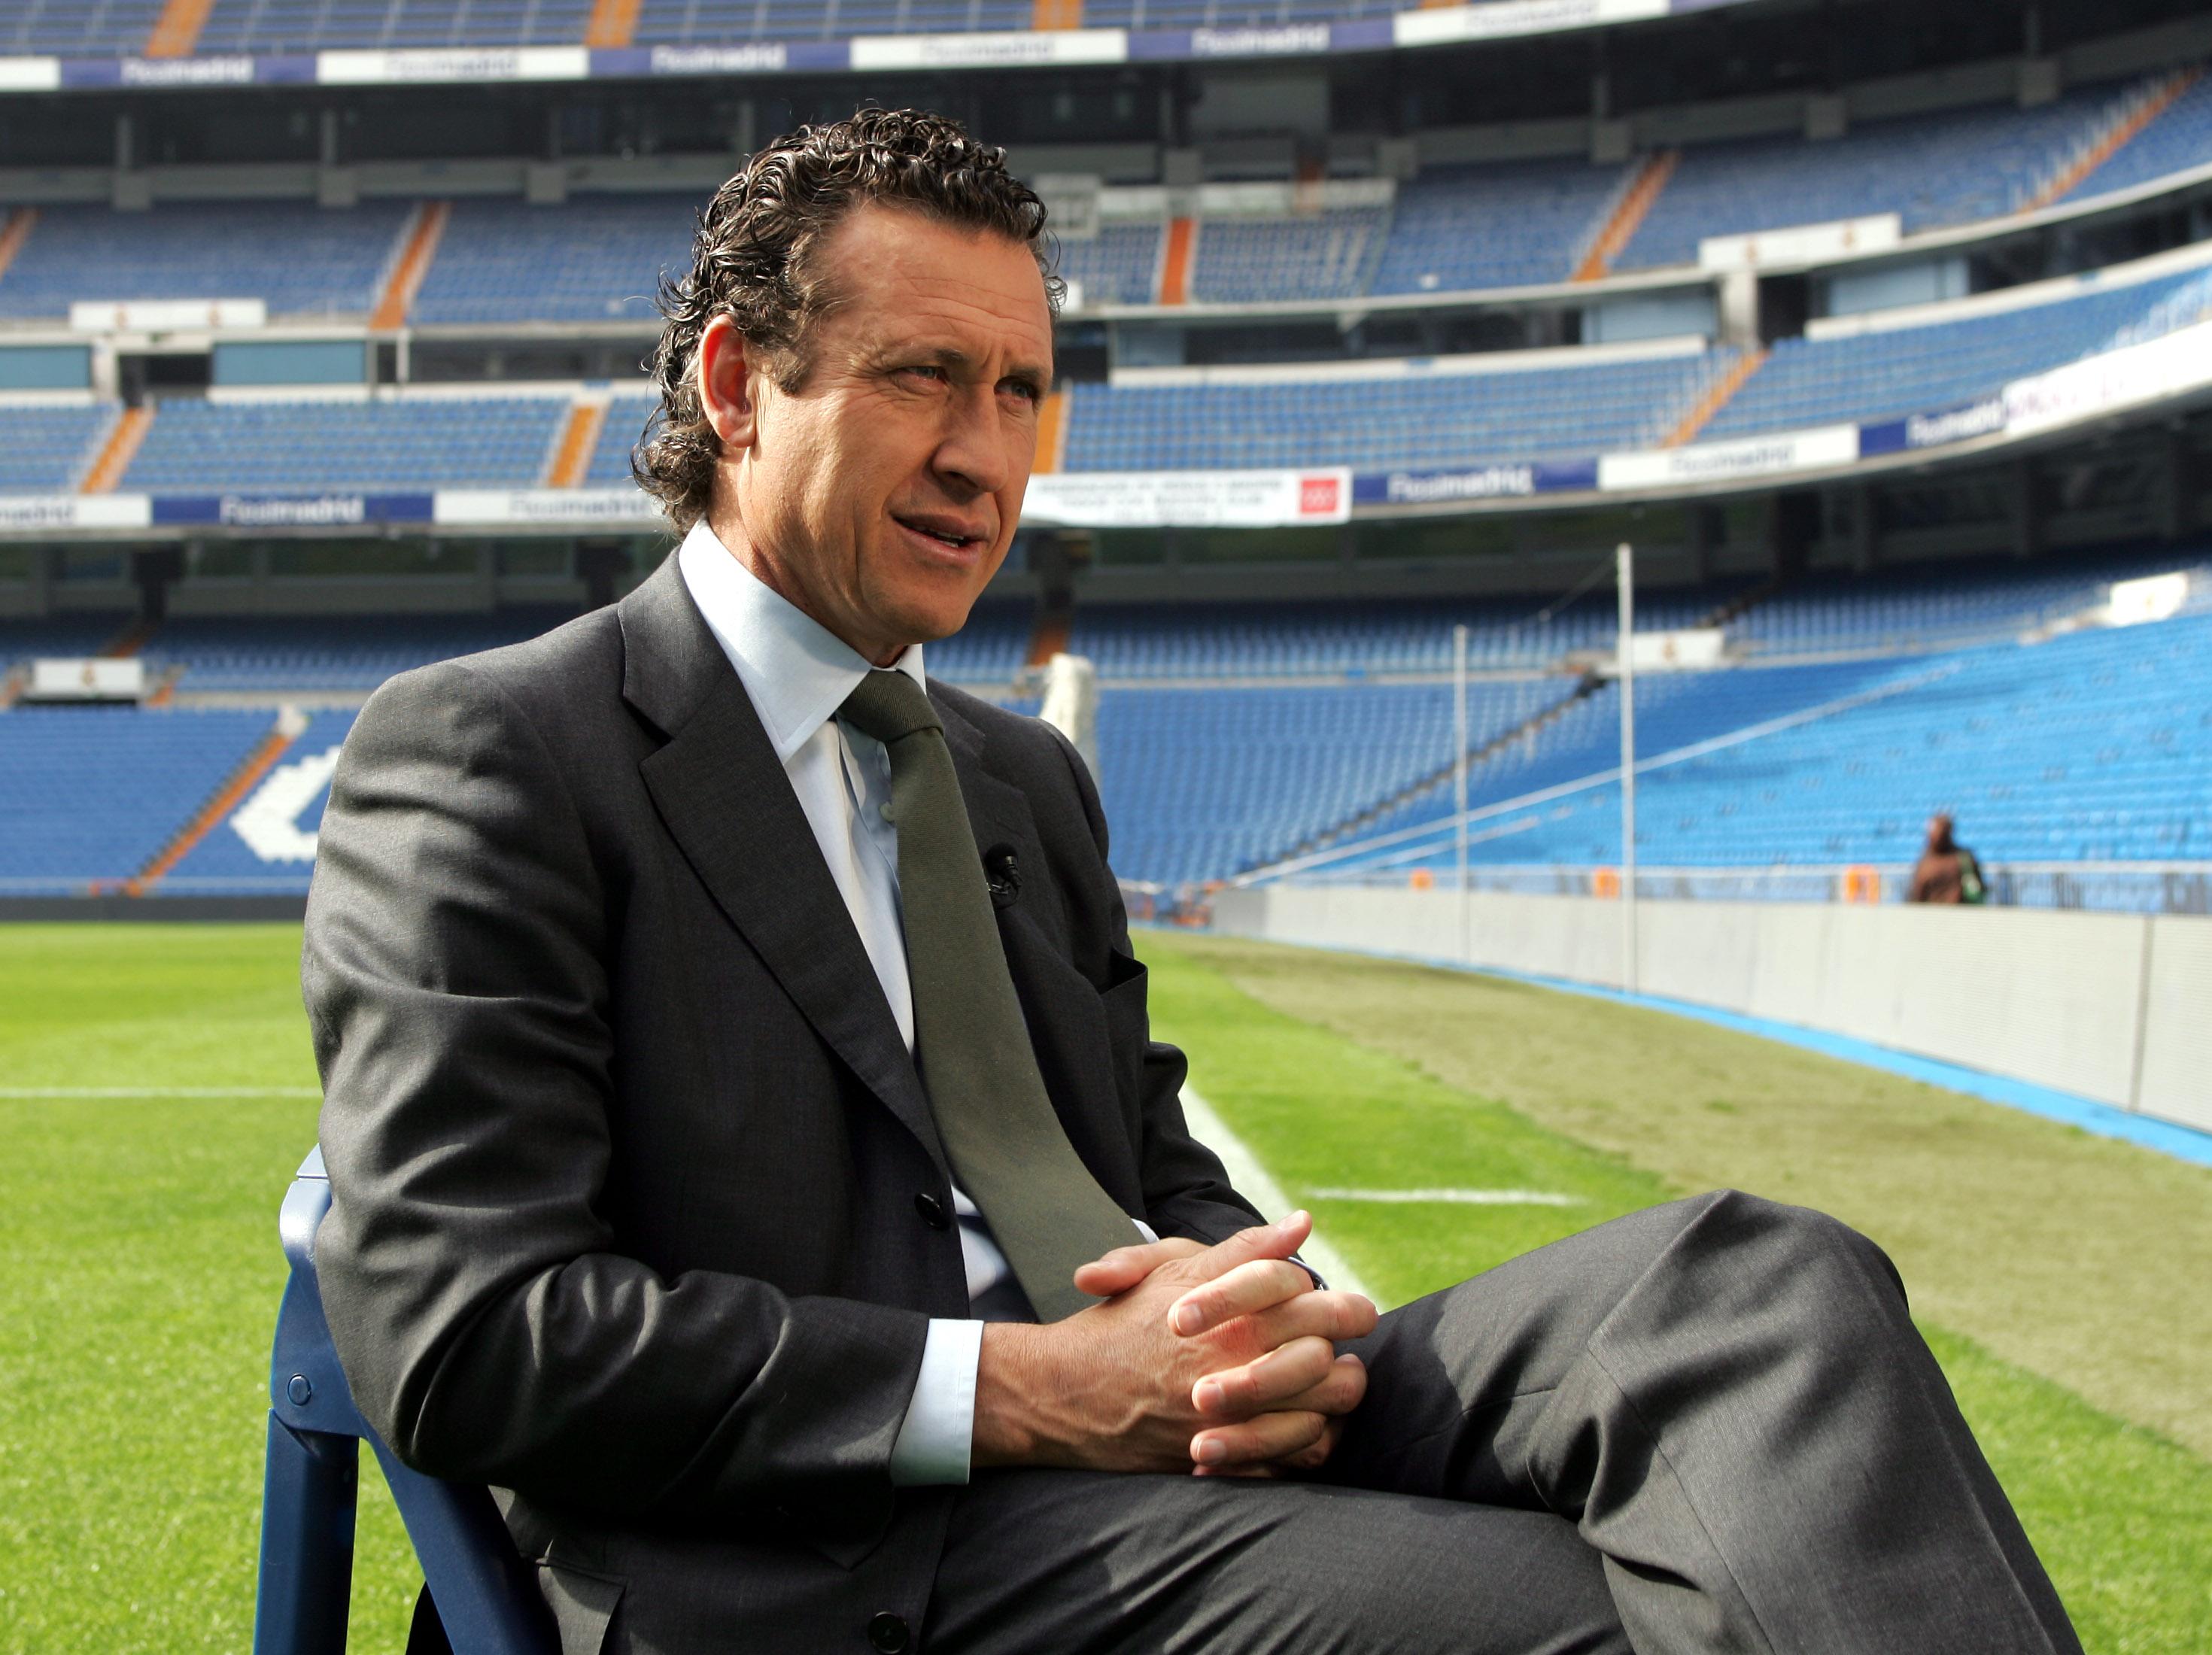 Valdano manda a jubilarse a Messi y alaga a CR7